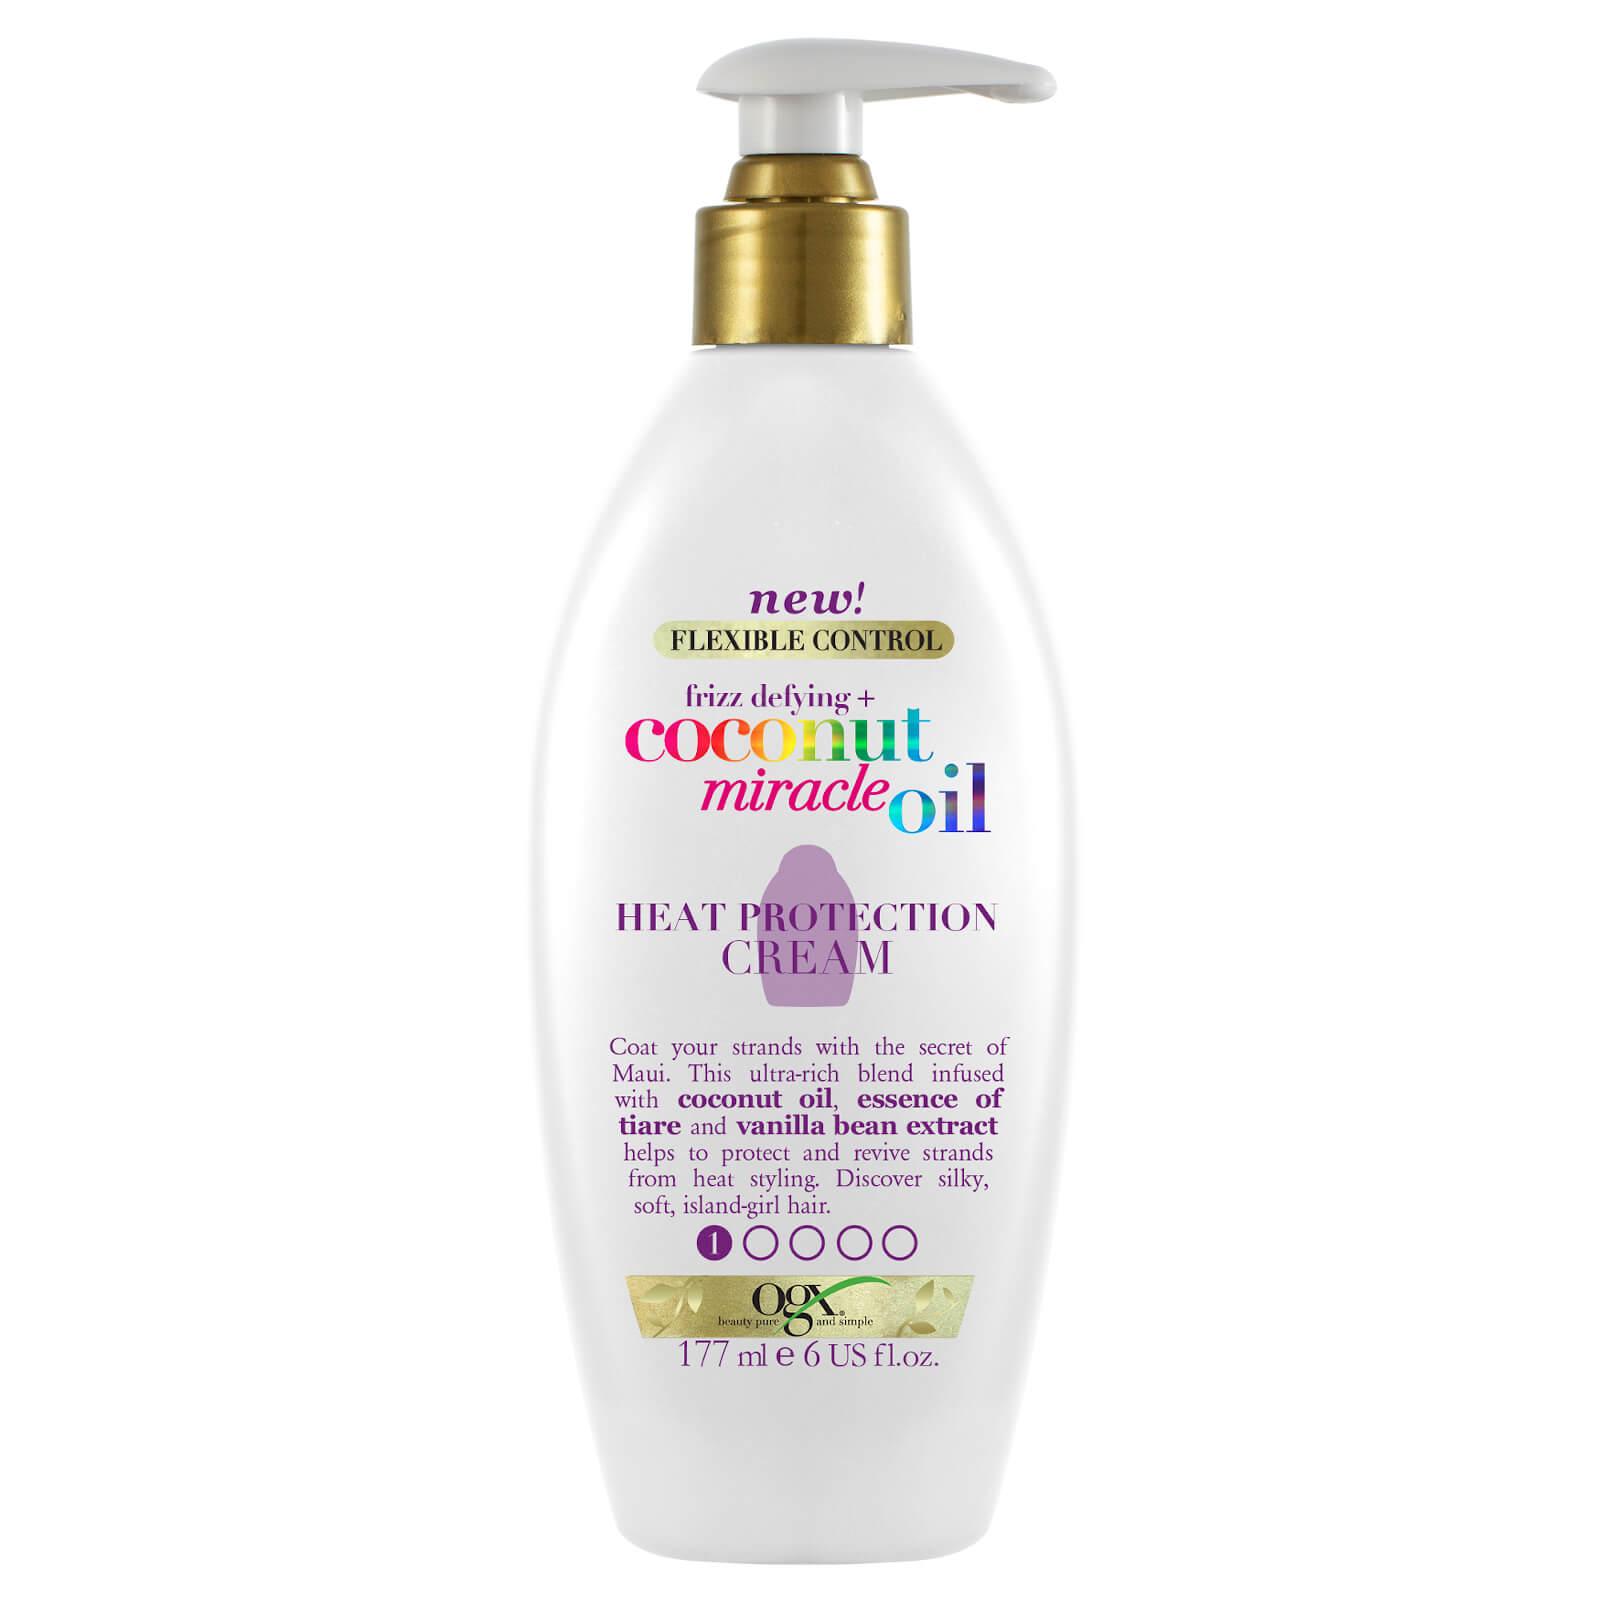 Купить OGX Frizz-Defying+ Coconut Miracle Oil Heat Protection Cream 177ml